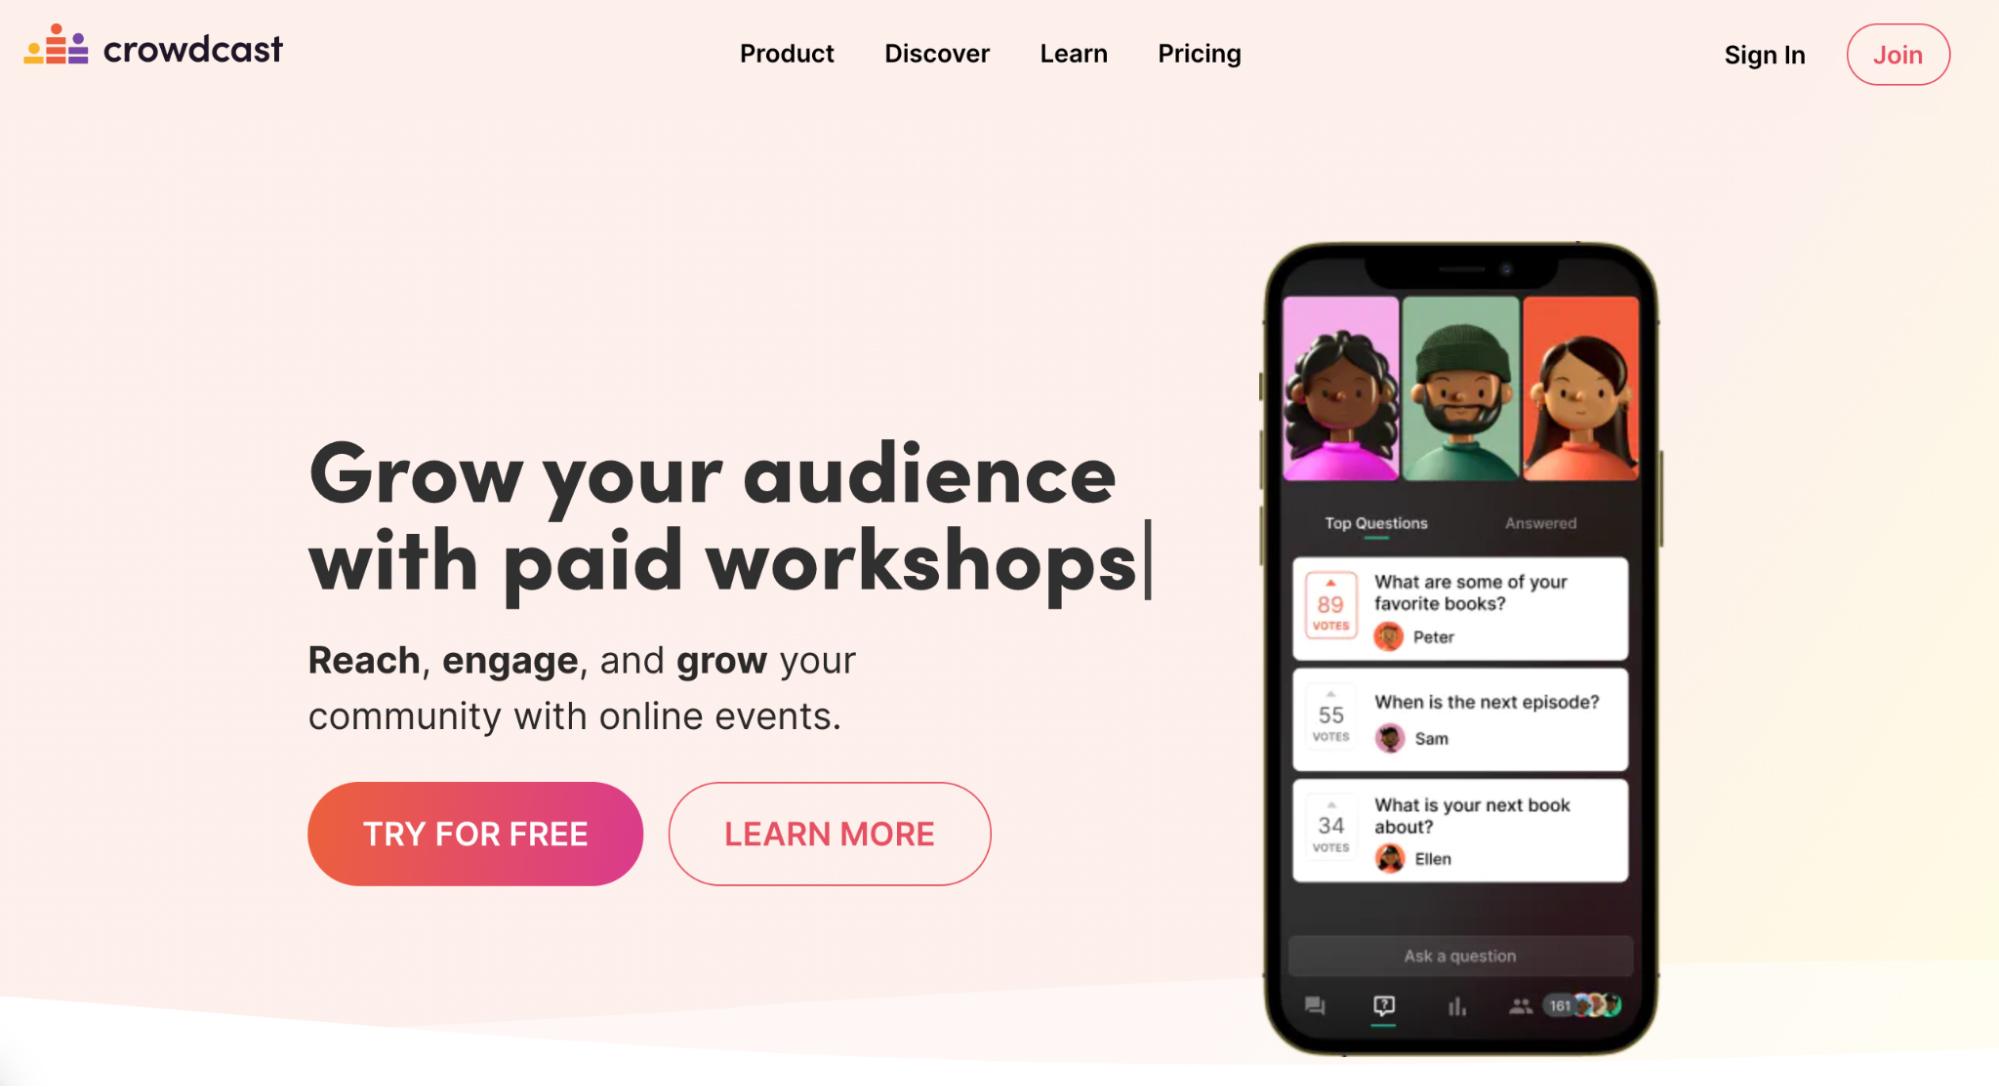 SaaS Marketing Automation Tools: Crowdcast Screenshot